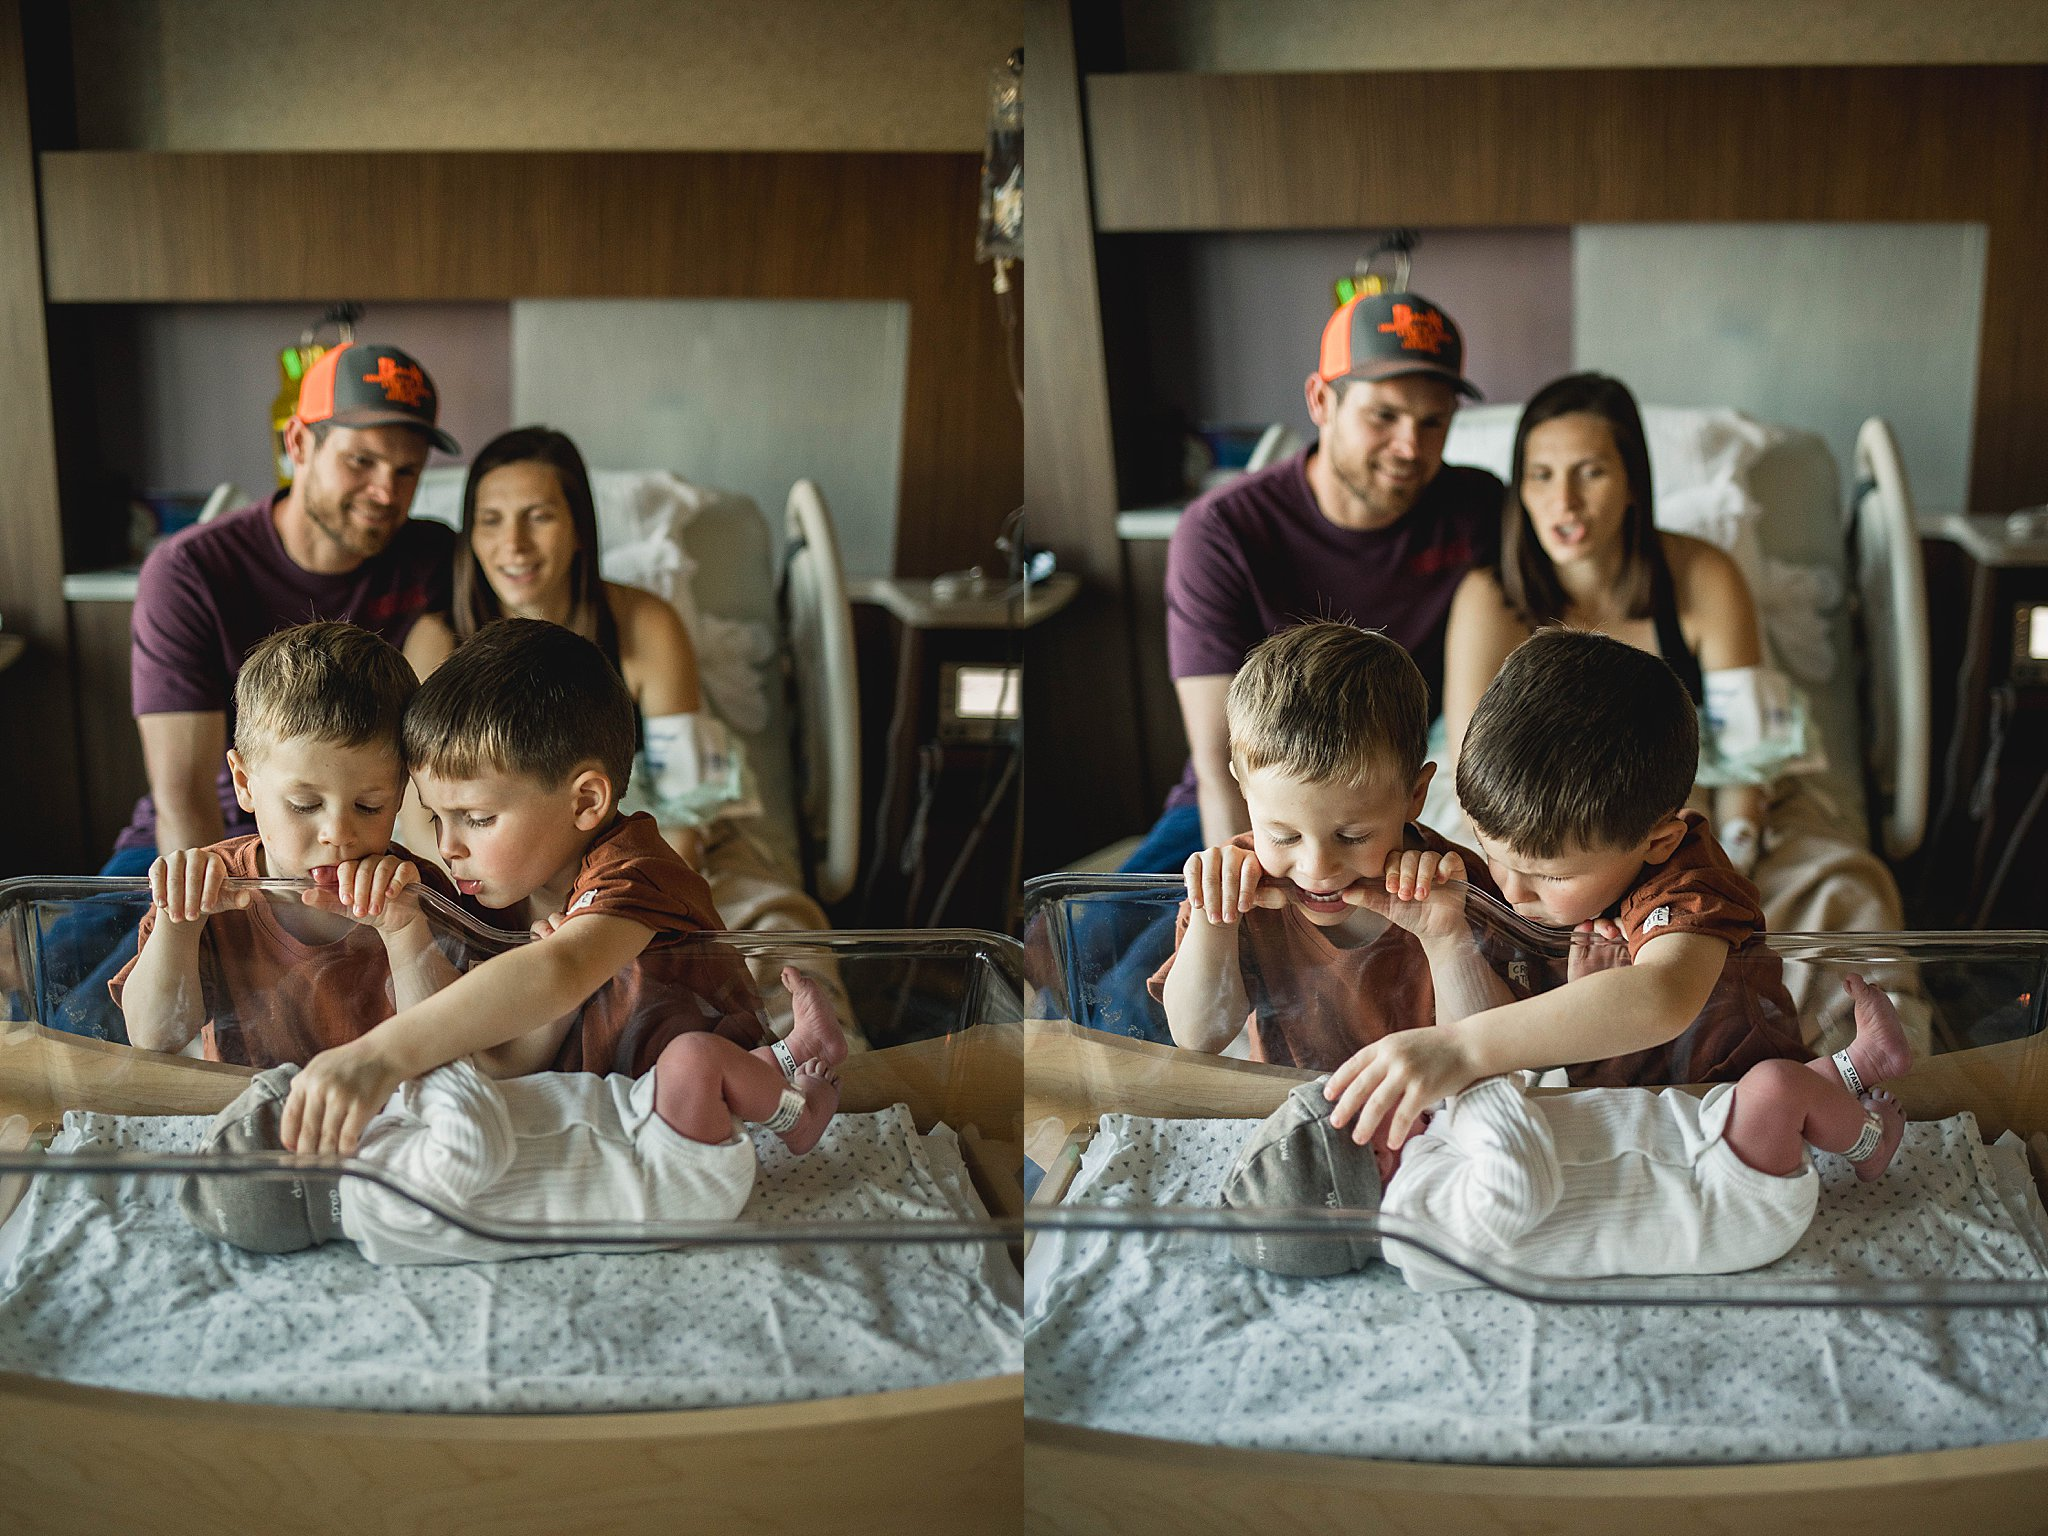 2019-03-16-hospital-baby-birth-photo-osage-beach-missouri-lake-11.jpg